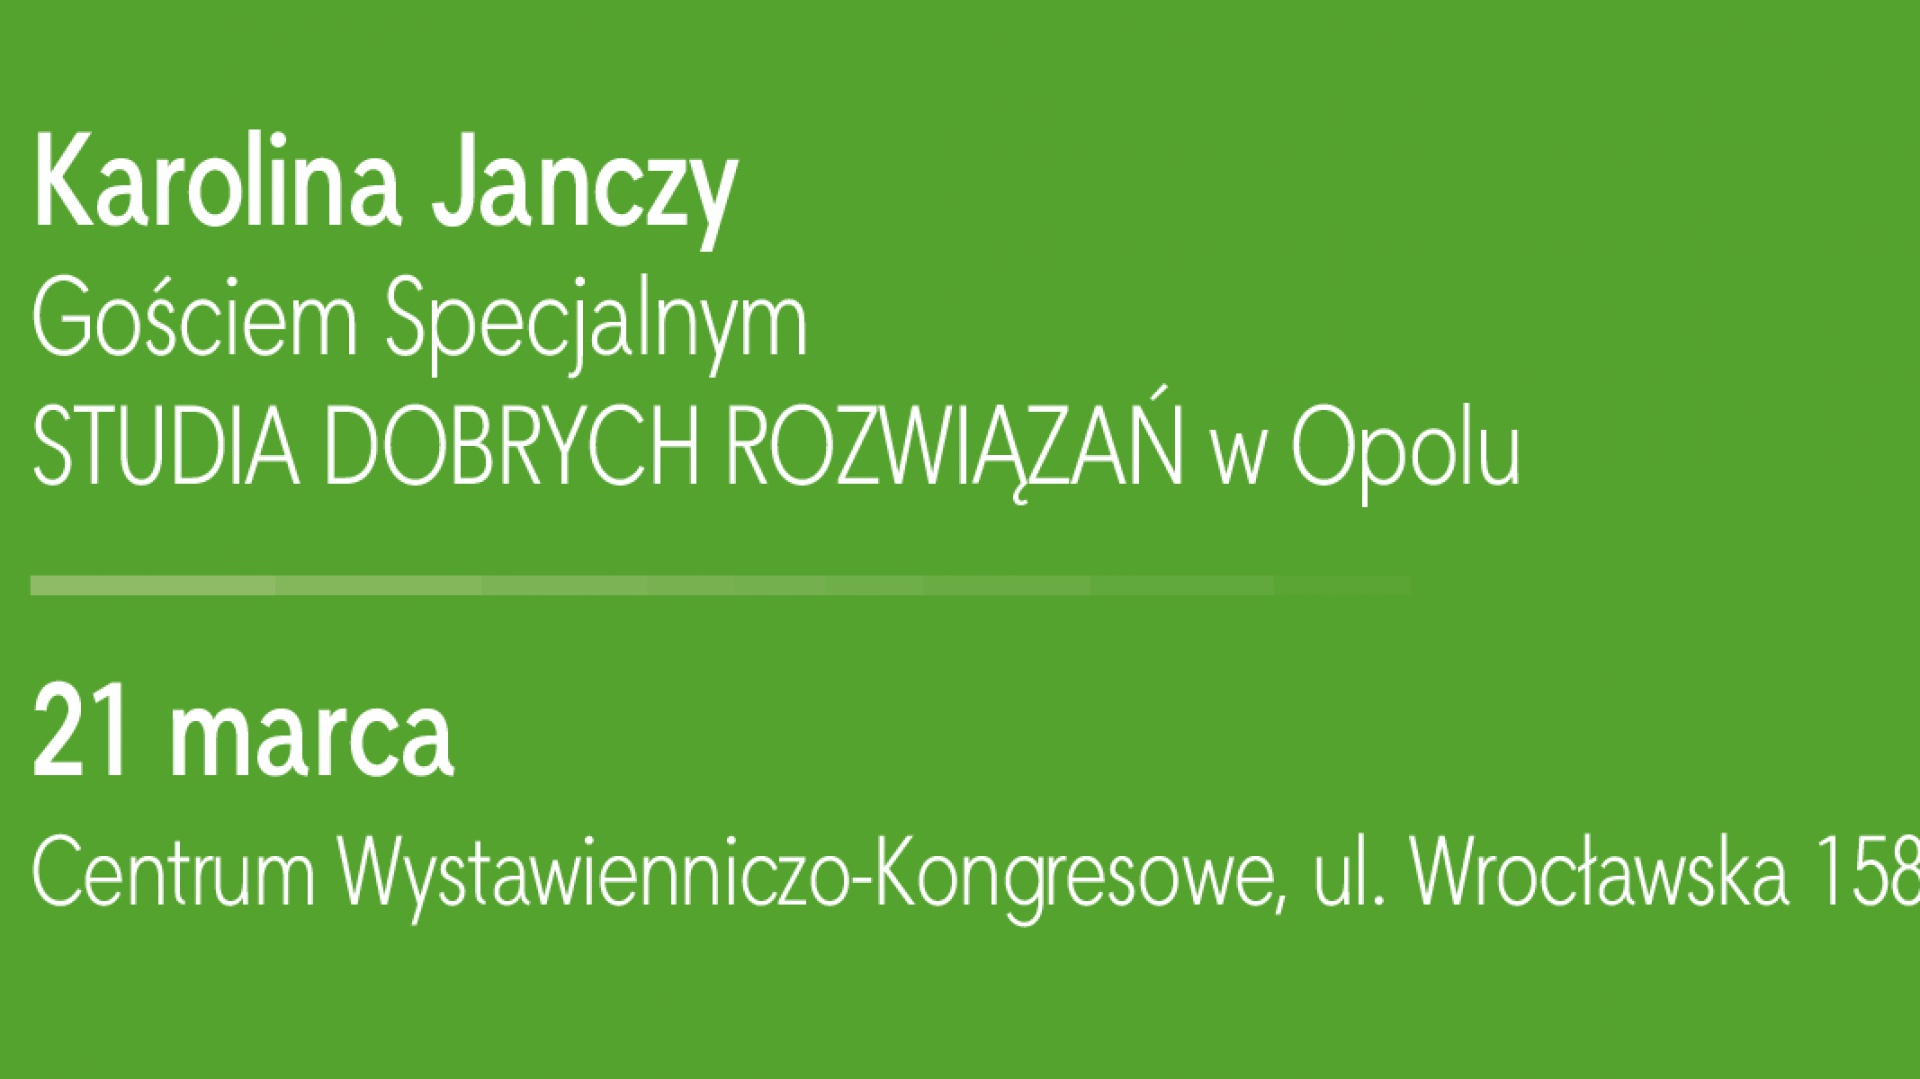 dr Karolina Janczy